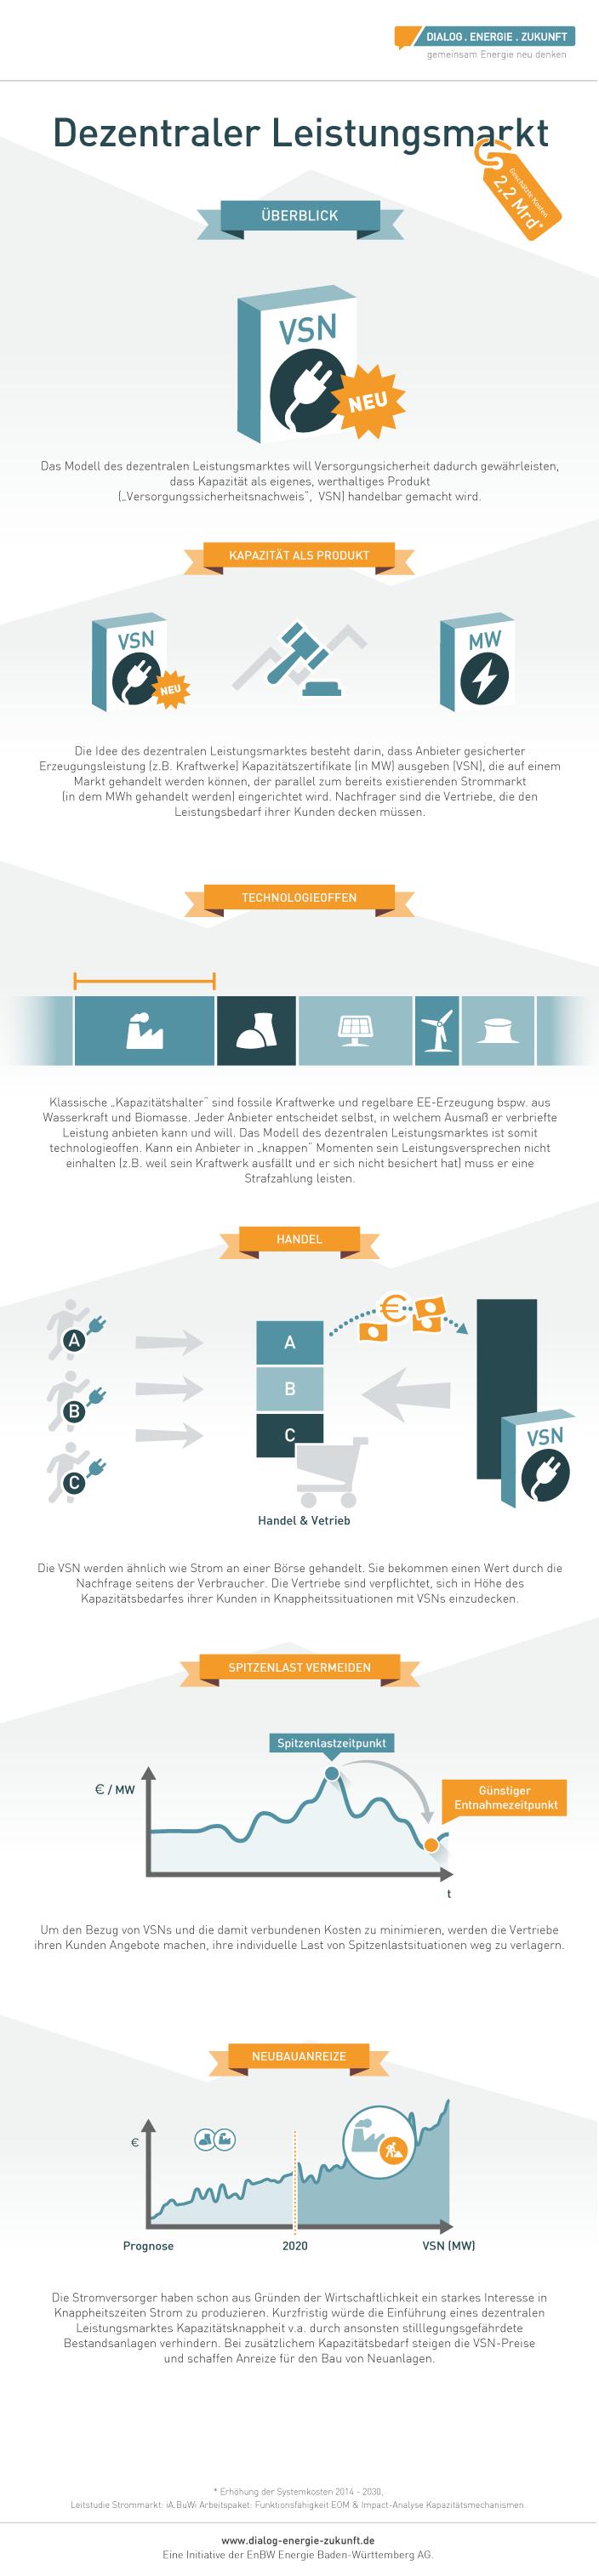 Infografik Dezentraler Leistungsmarkt Kapazitätsmarktmodelle